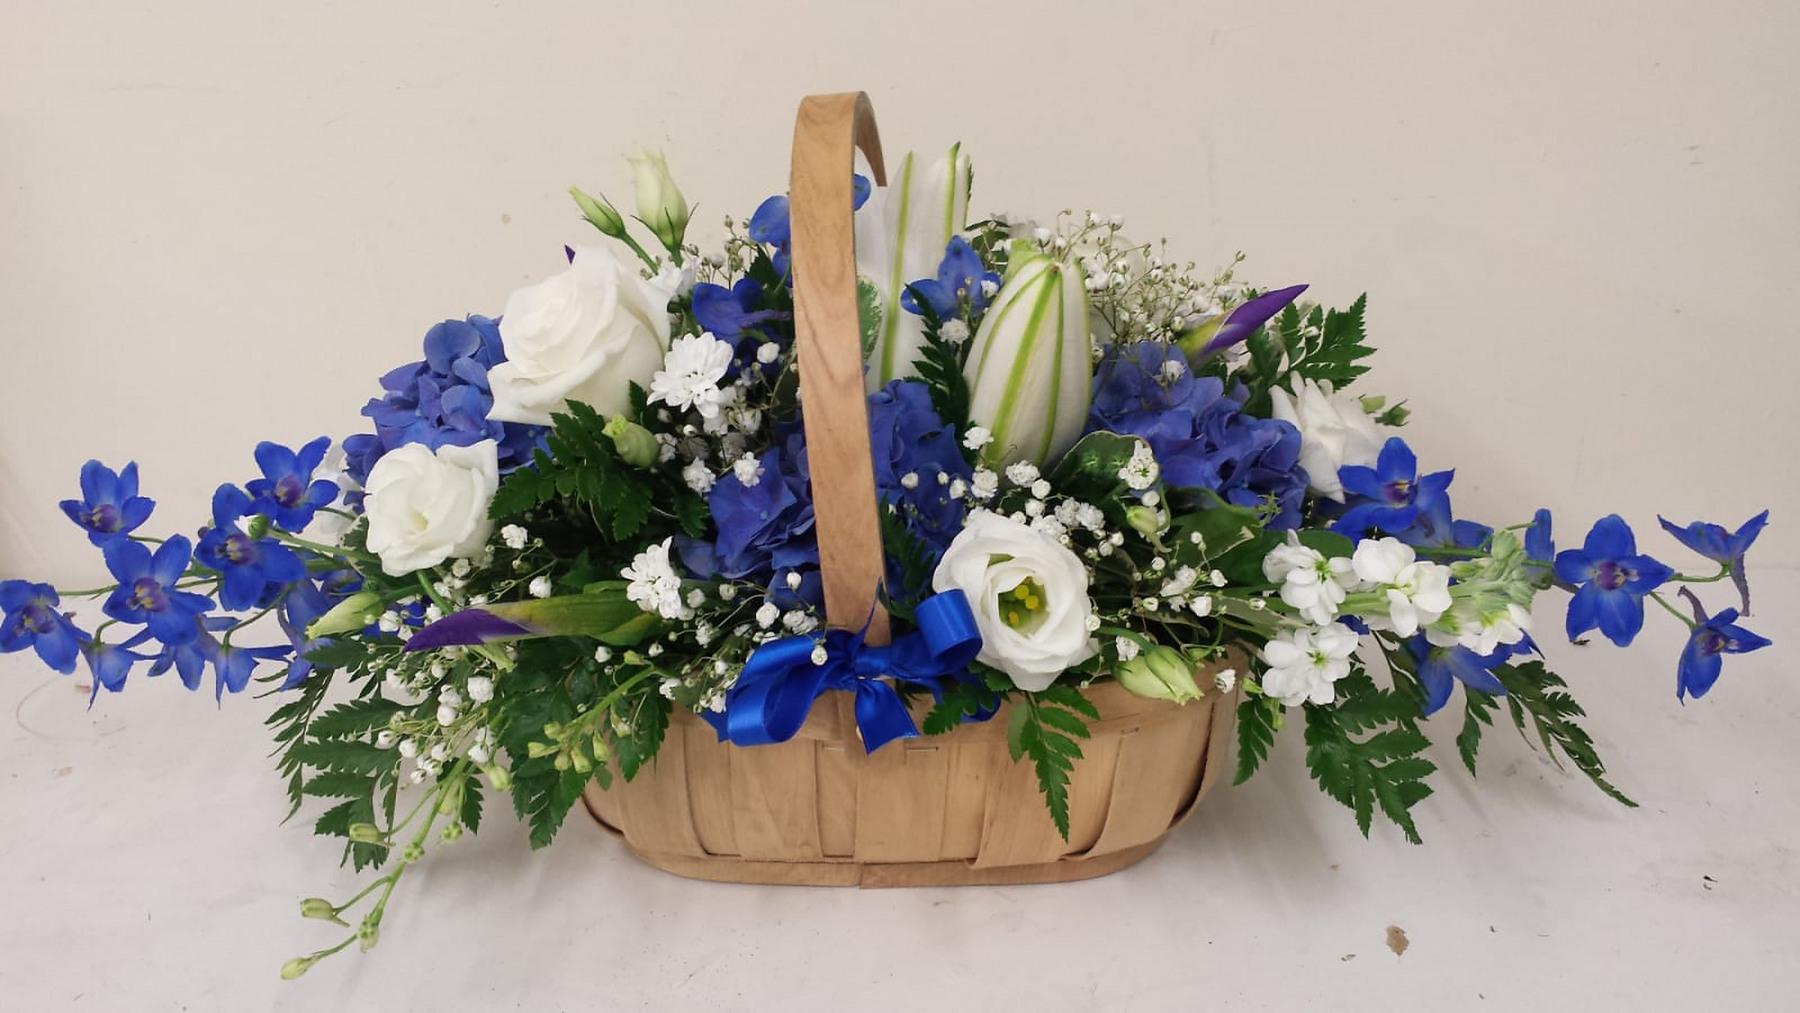 jugs-baskets-floral-arrangements-rugeley-florist-007